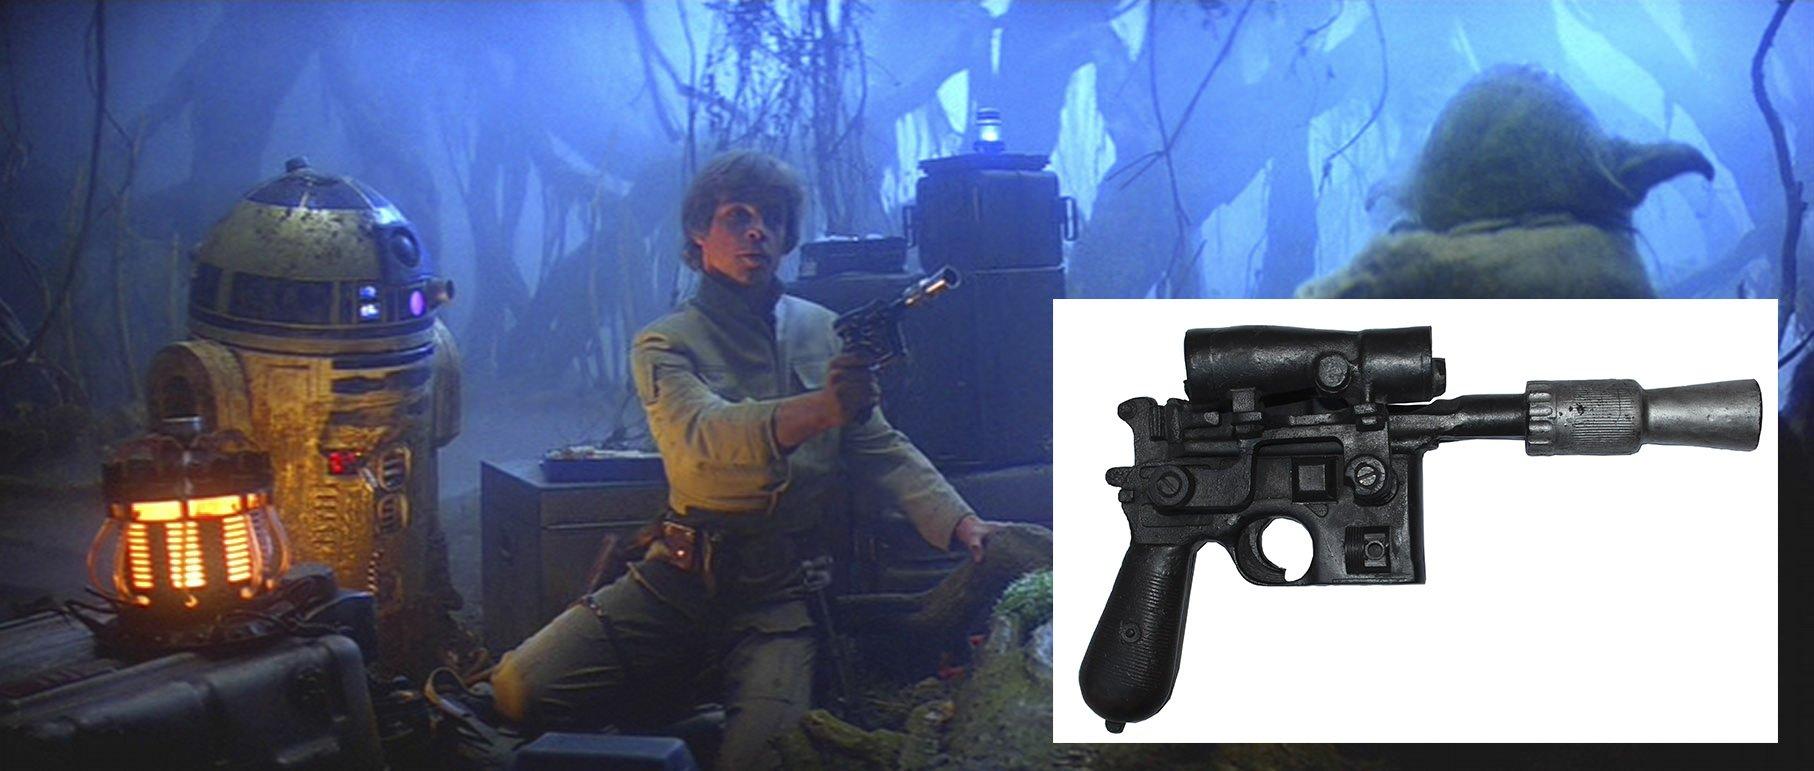 бластер люка скайуокера купить аукцион звездные войны star wars luke skywalker blaster auction buy